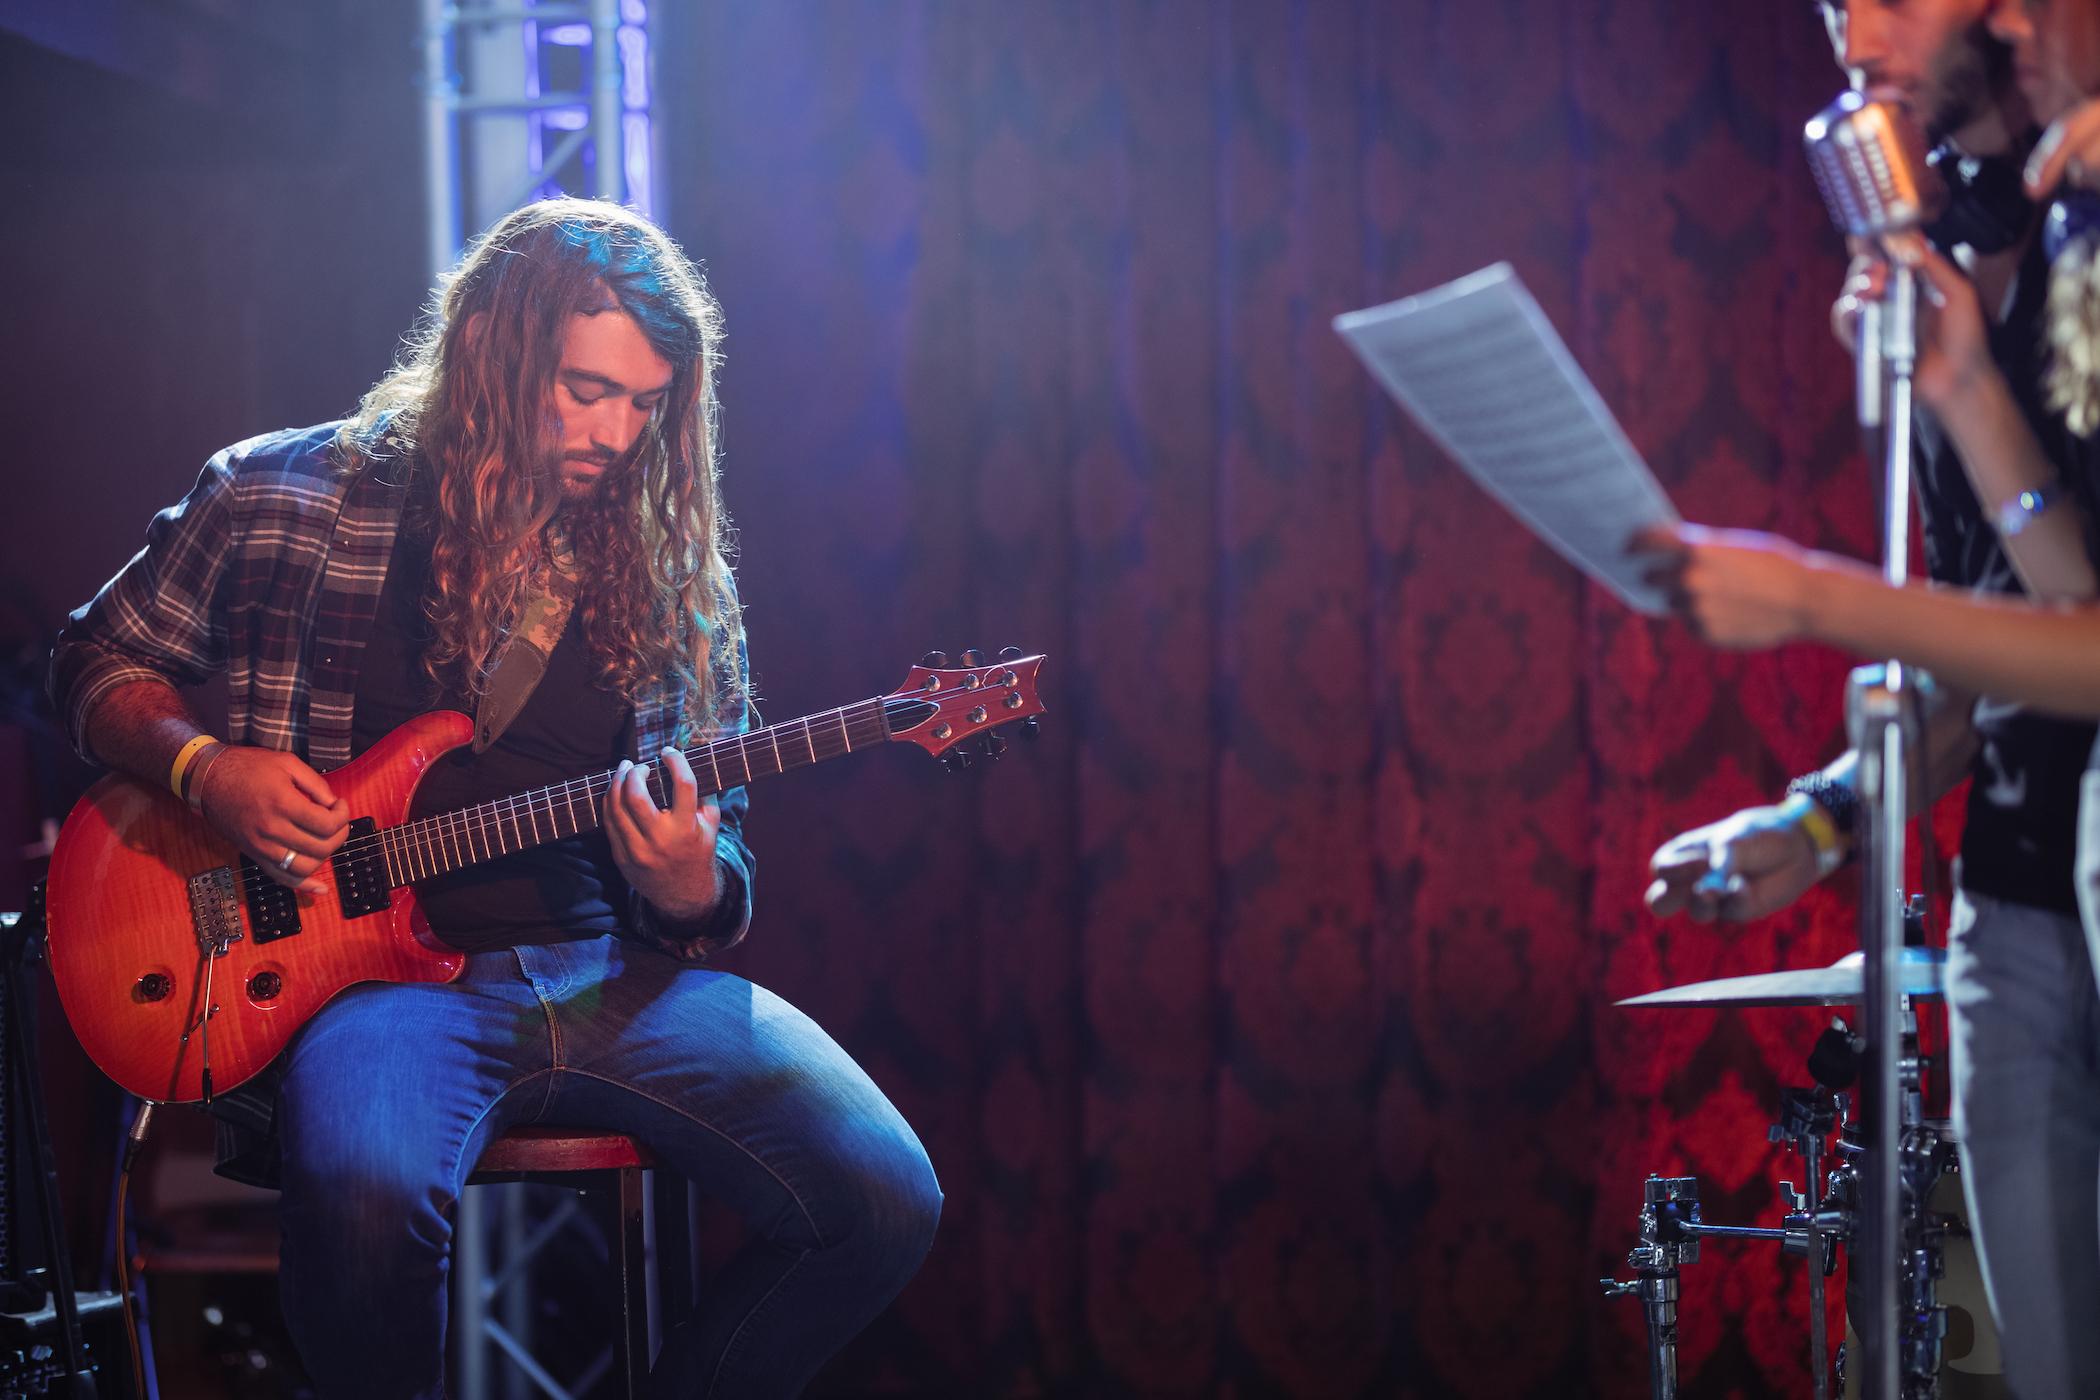 Fender and Orville Guitars